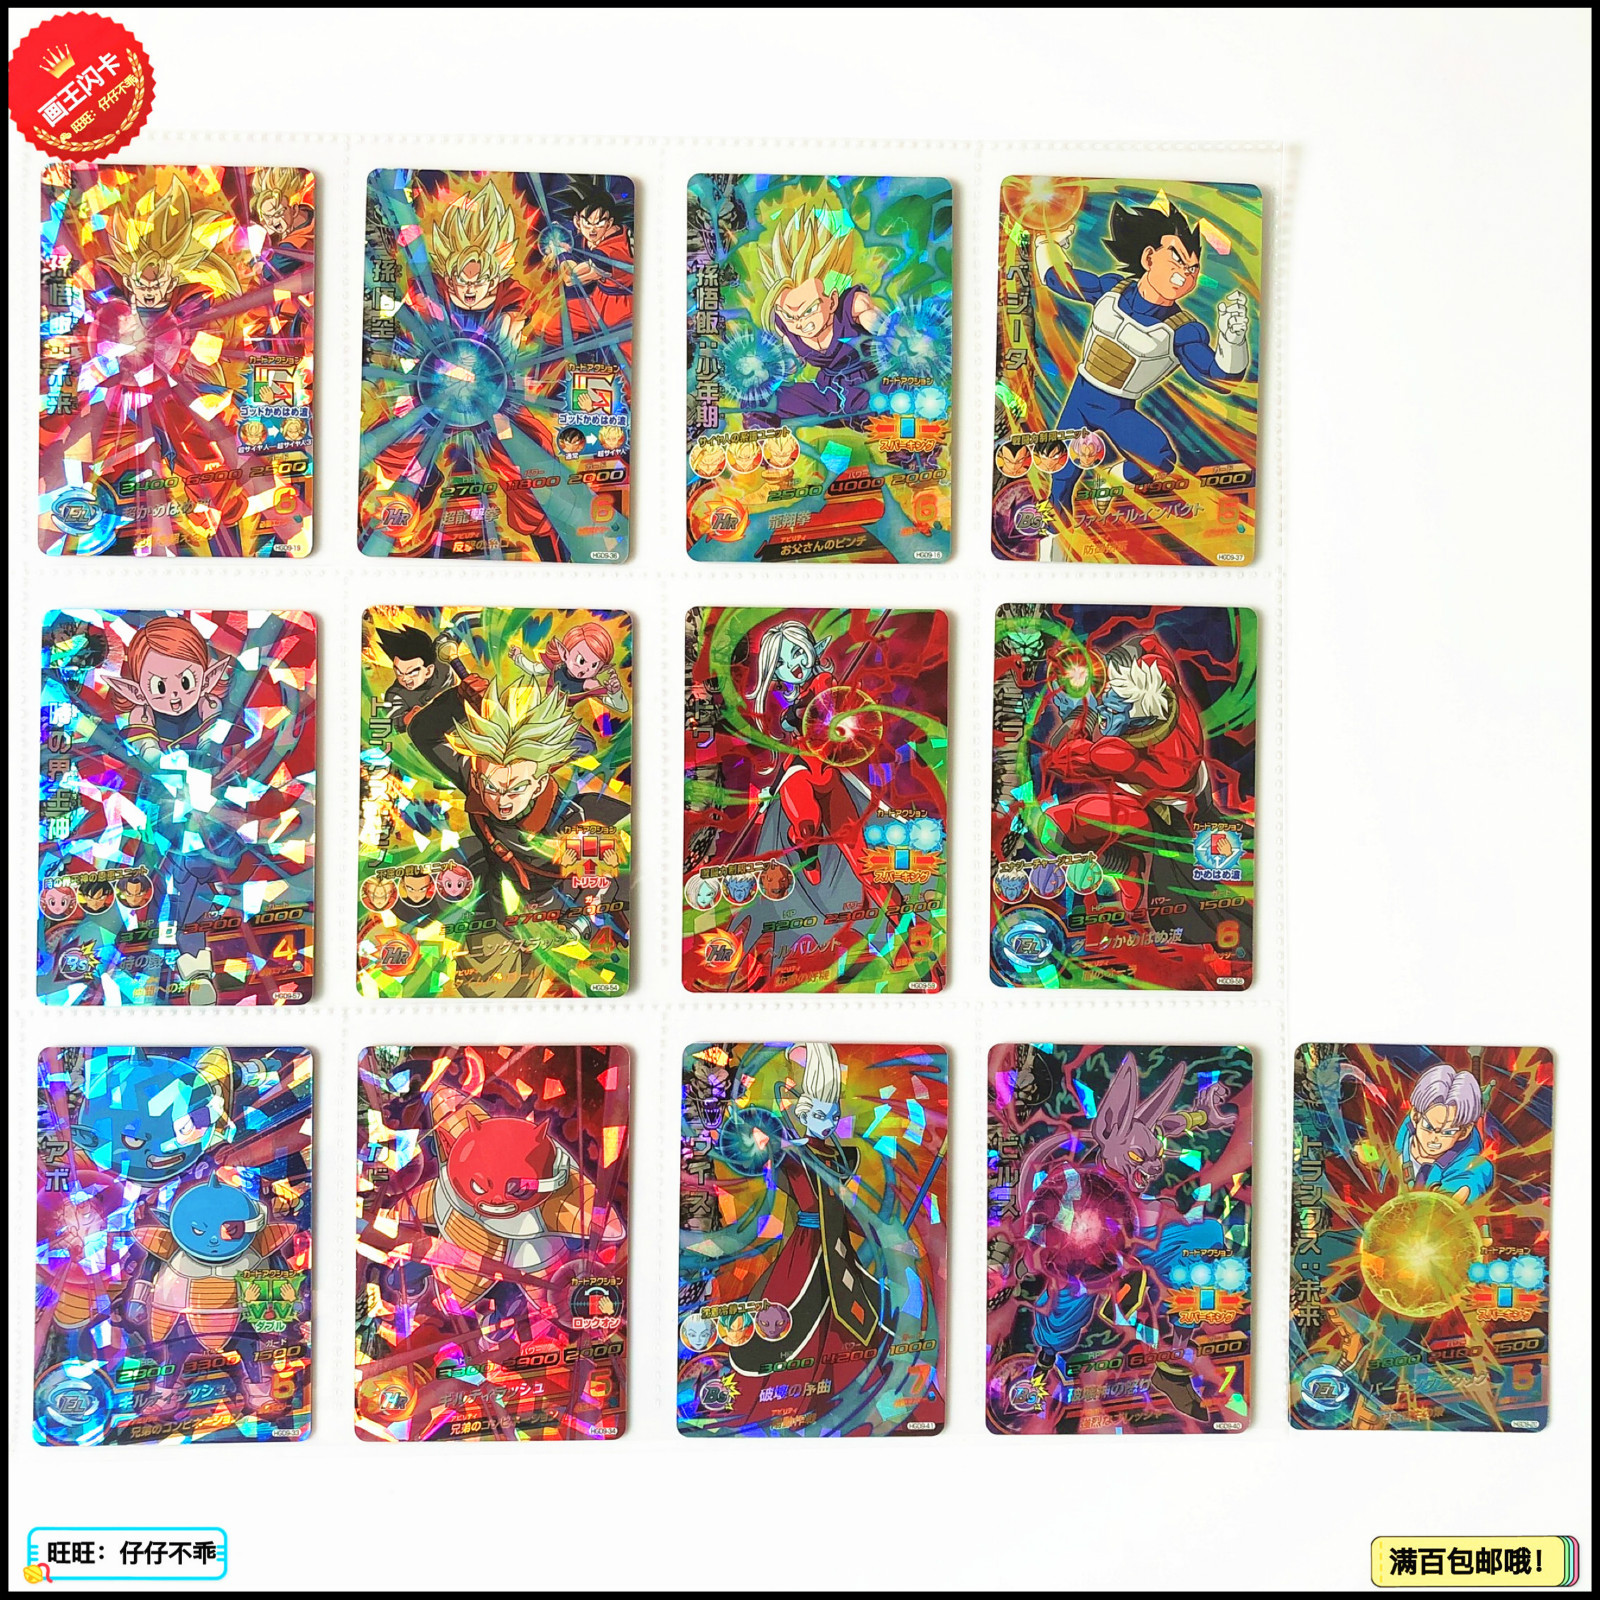 Japan Original Dragon Ball Hero Card SR HGD9 3 Stars God Super Saiyan Goku Toys Collectibles Game Collection Anime Cards